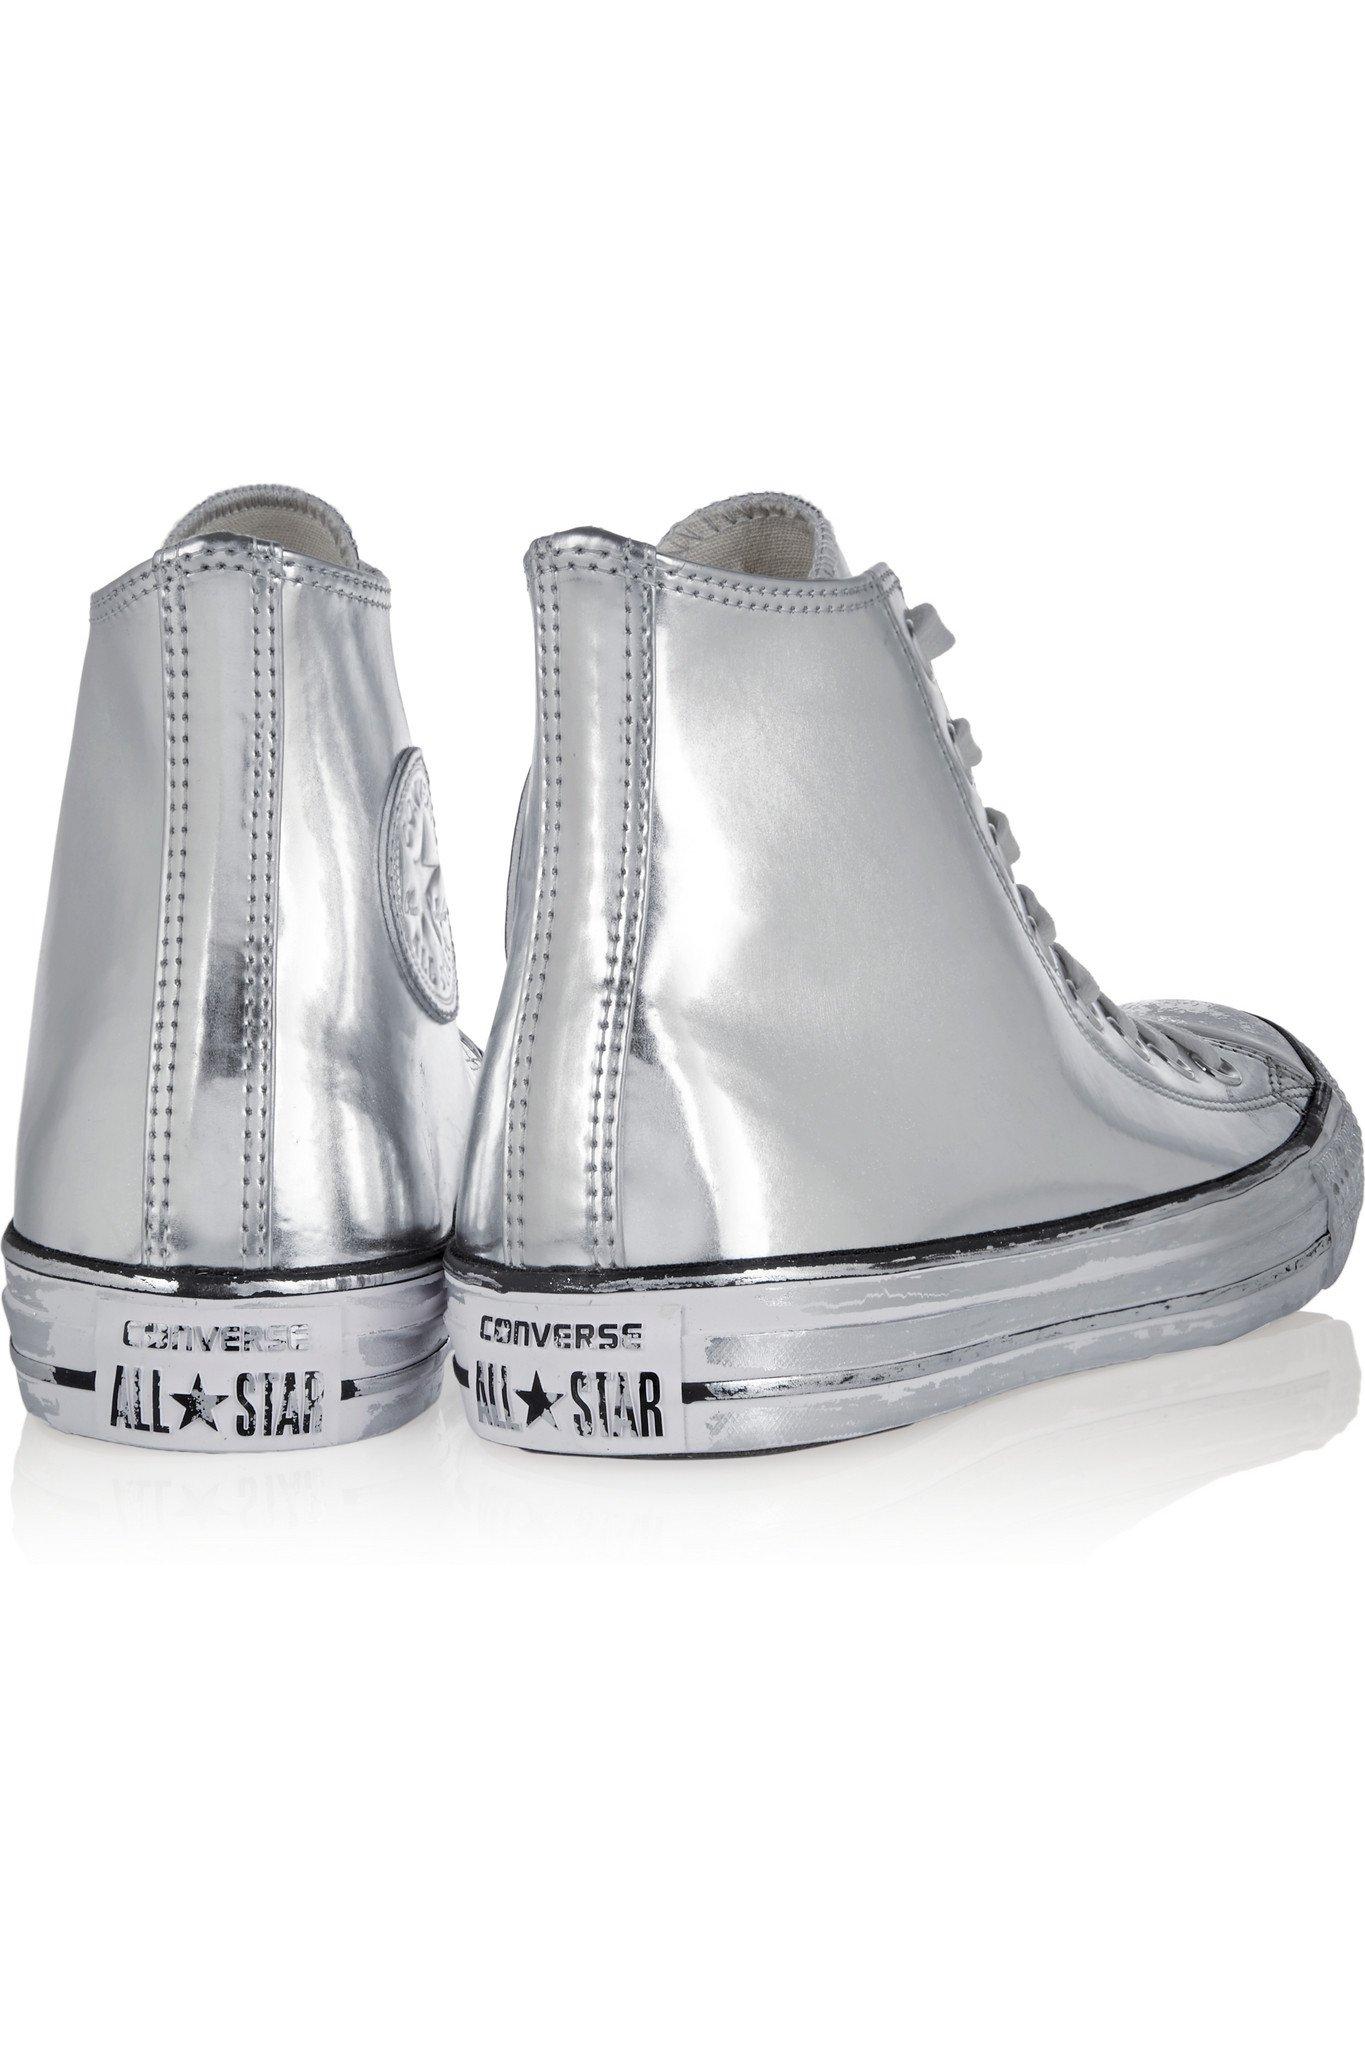 Converse Chuck Taylor All Star Chrome Metallic Leather